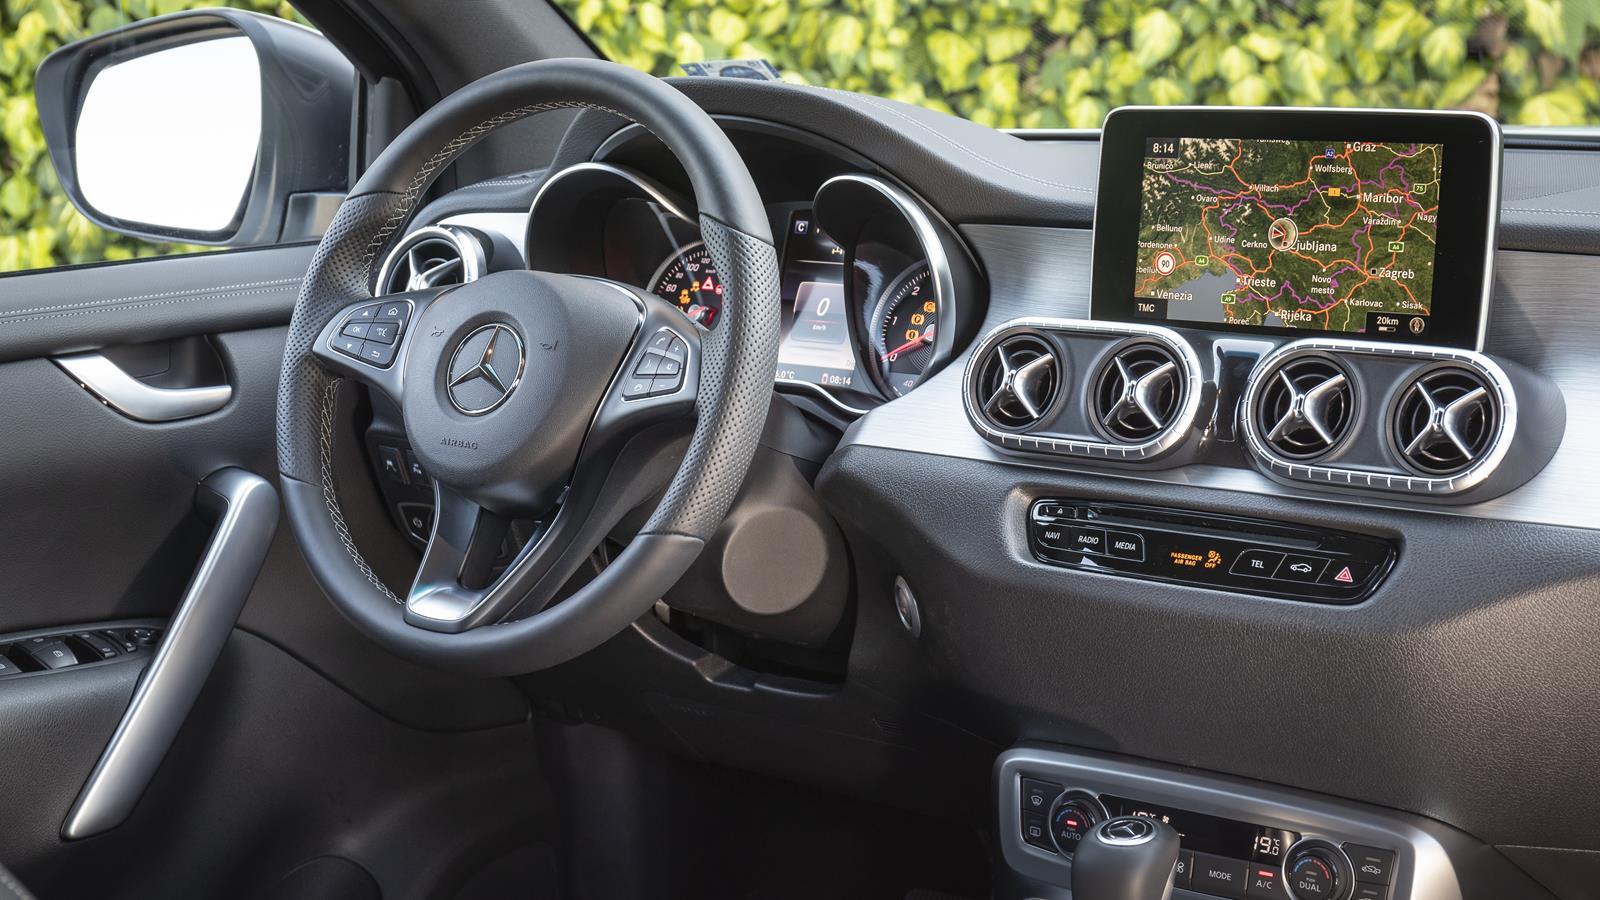 The Mercedes-Benz X-Class V6 interior.